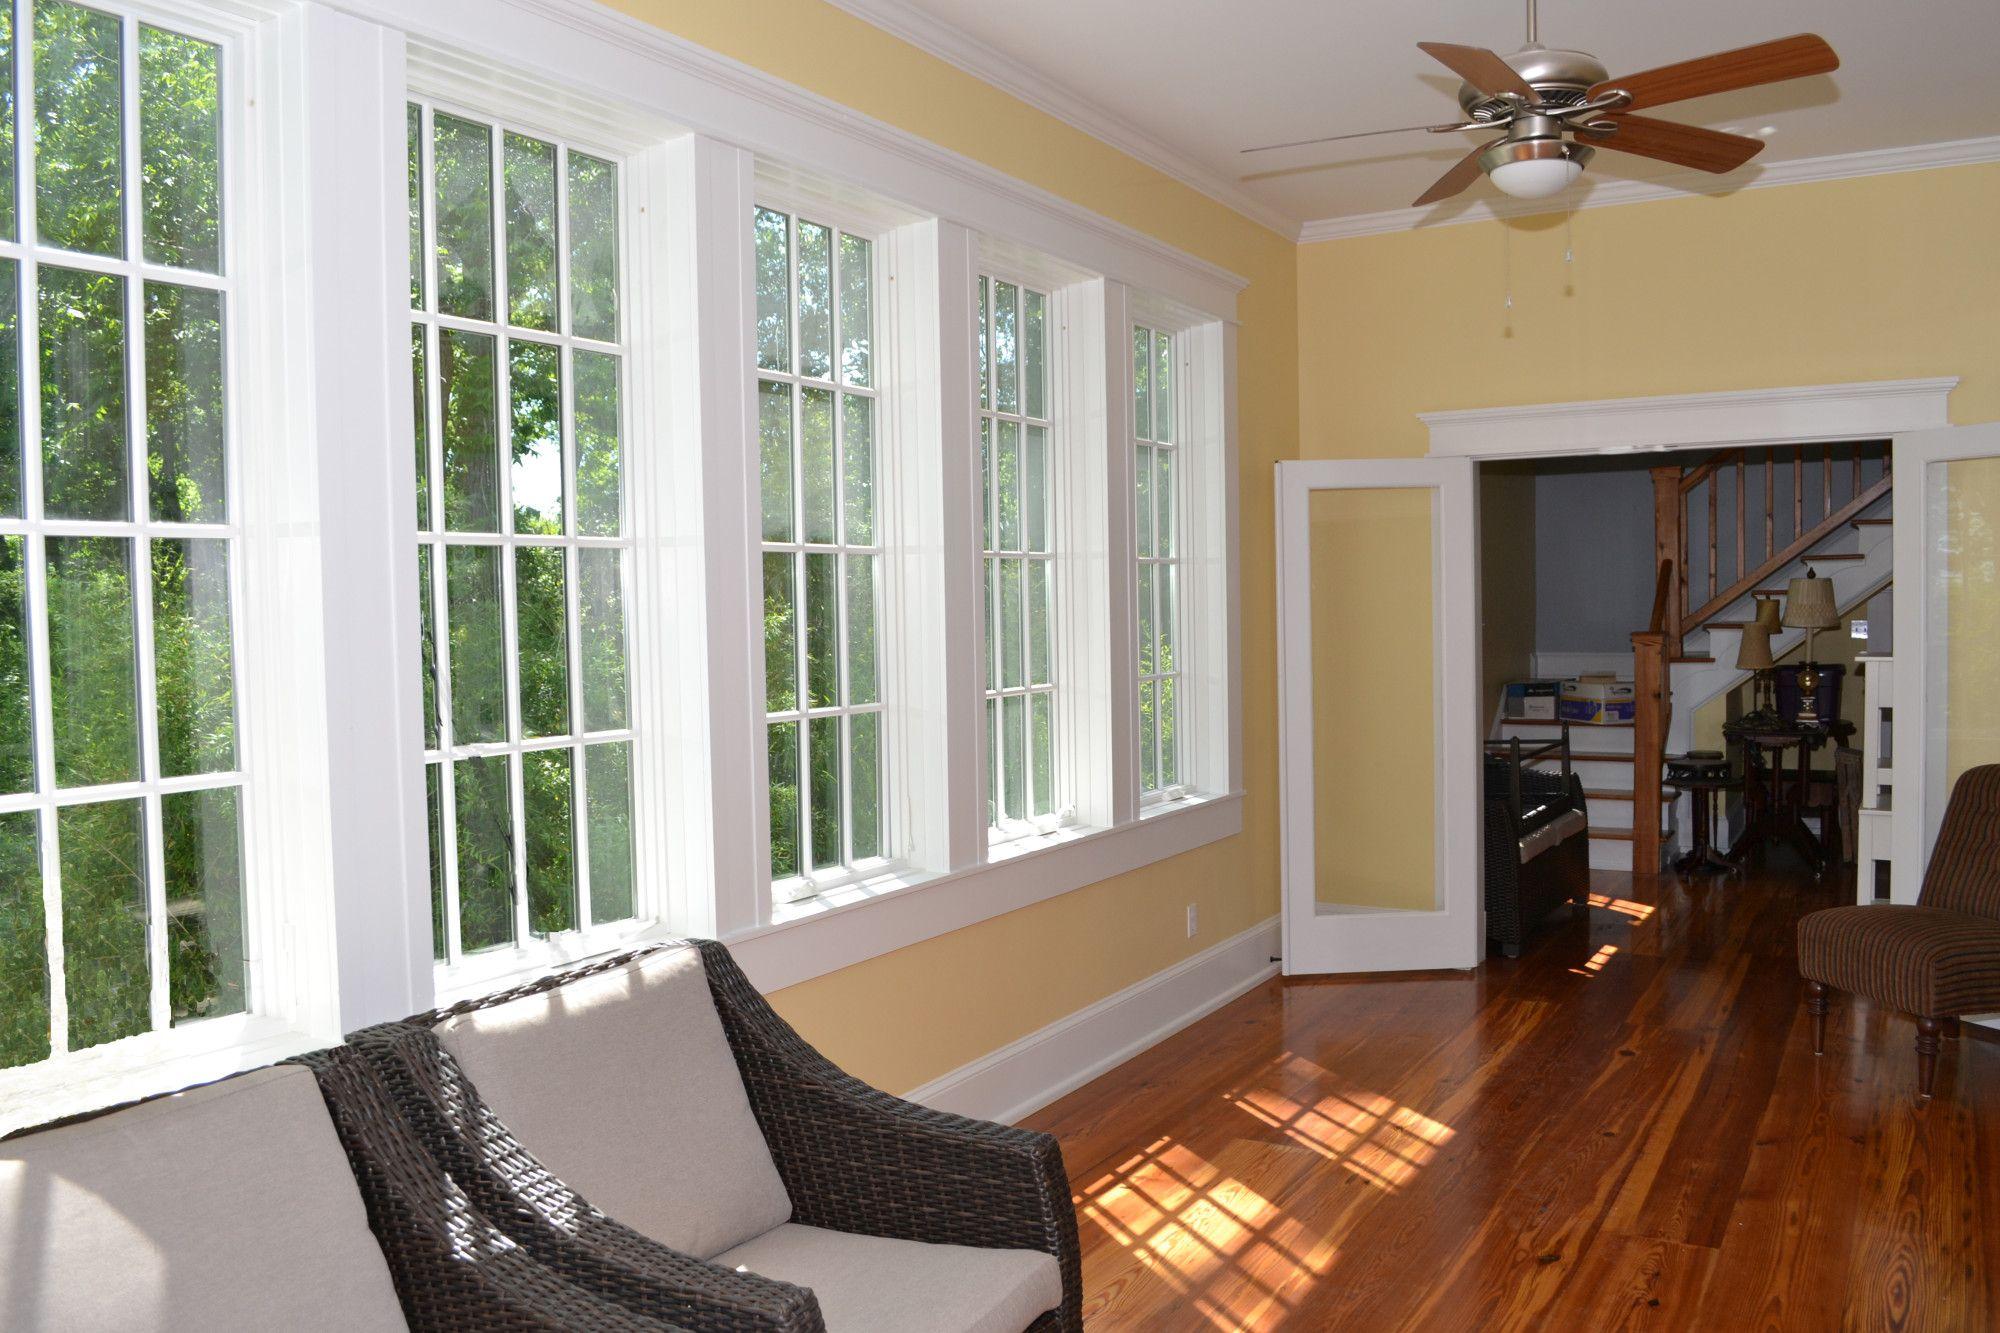 Modern Sunroom Exterior Indoor Outdoor Room Modern Sunroom Exterior